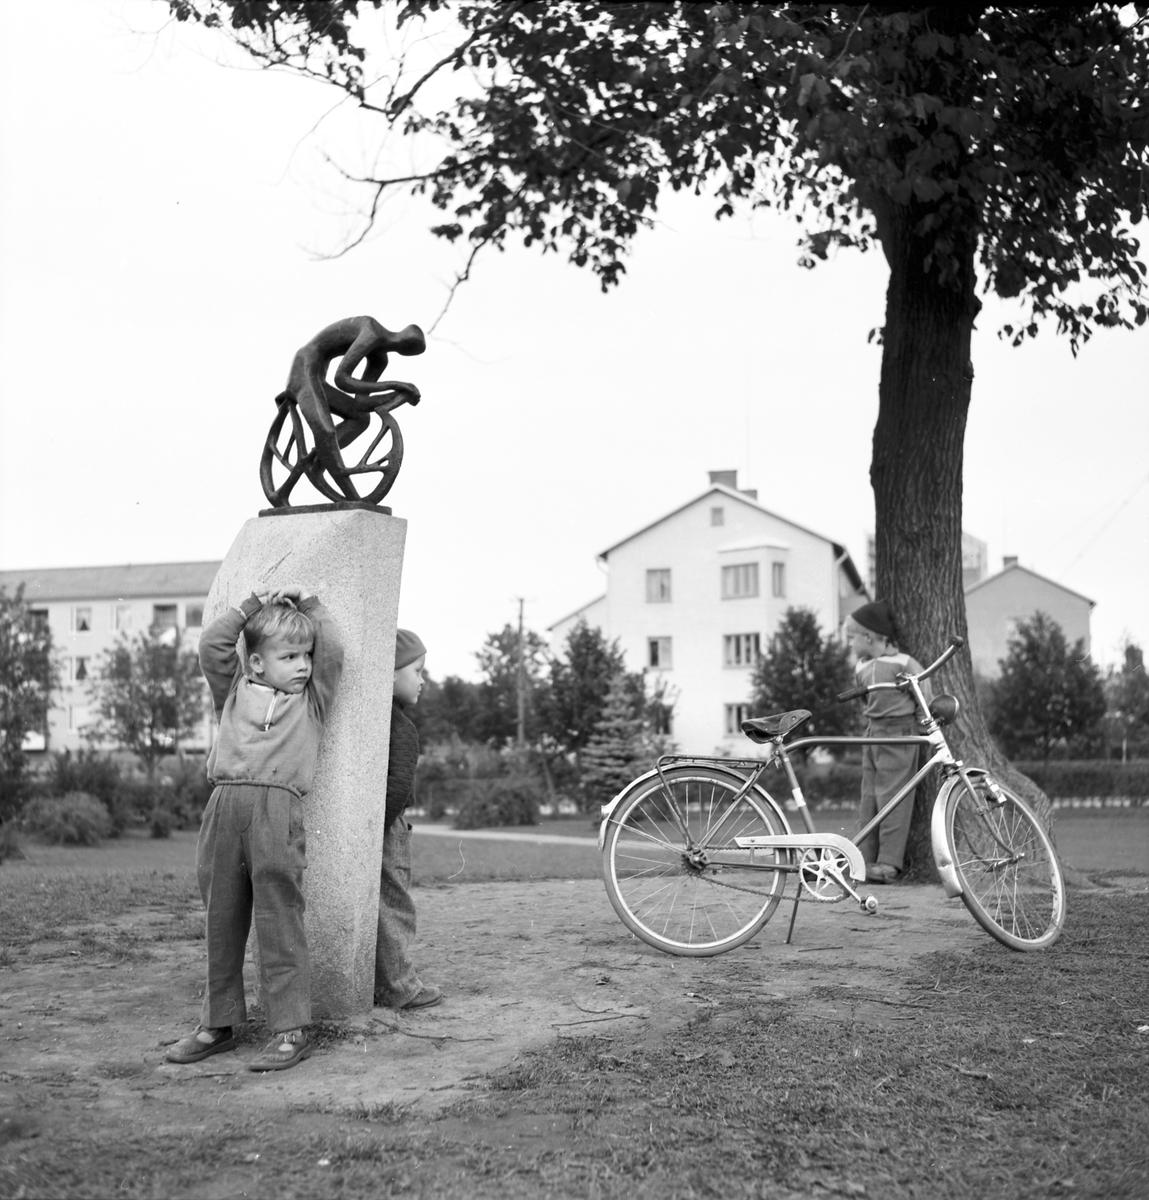 Den 11 februari 1957. Lekplats. Staty.